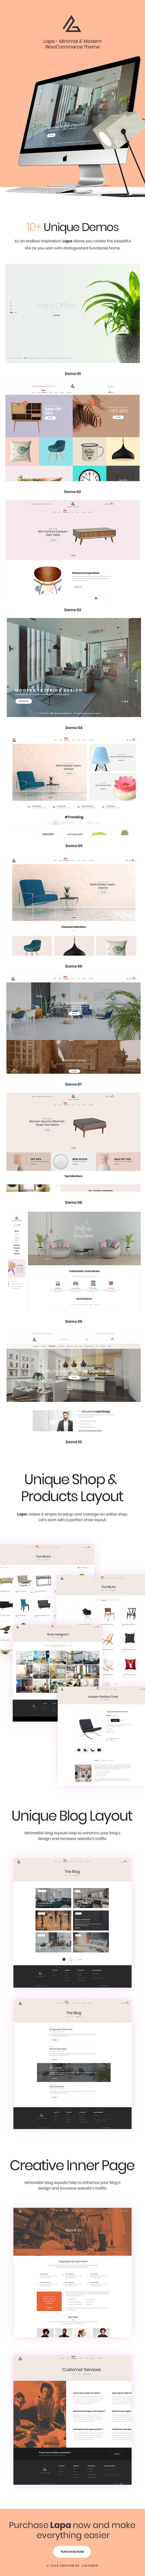 Lapa - Minimal & Modern WooCommerce Theme - 1